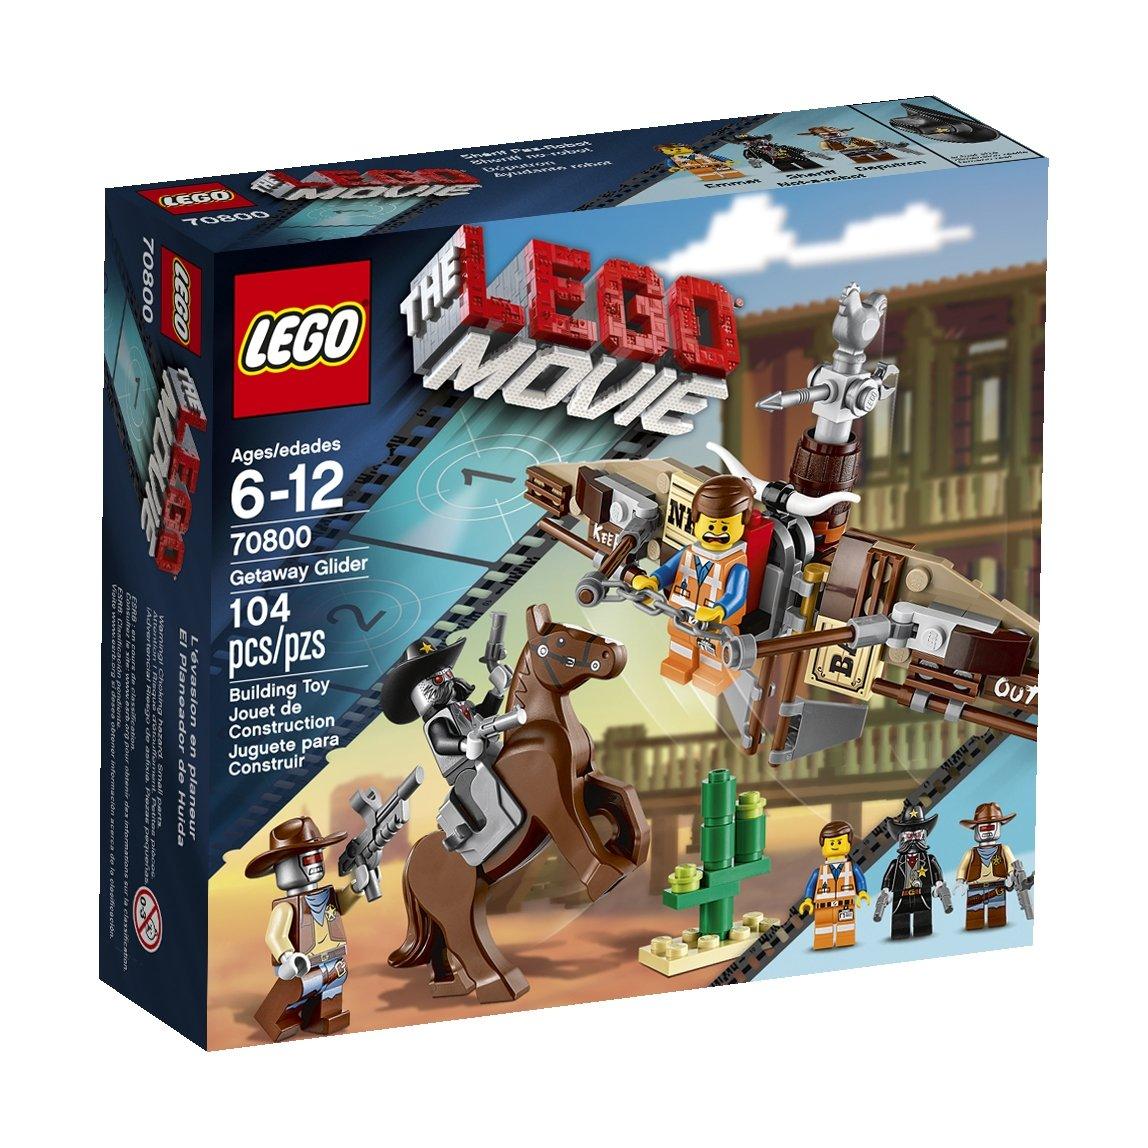 amazon com lego the lego movie getaway glider 70800 toys games